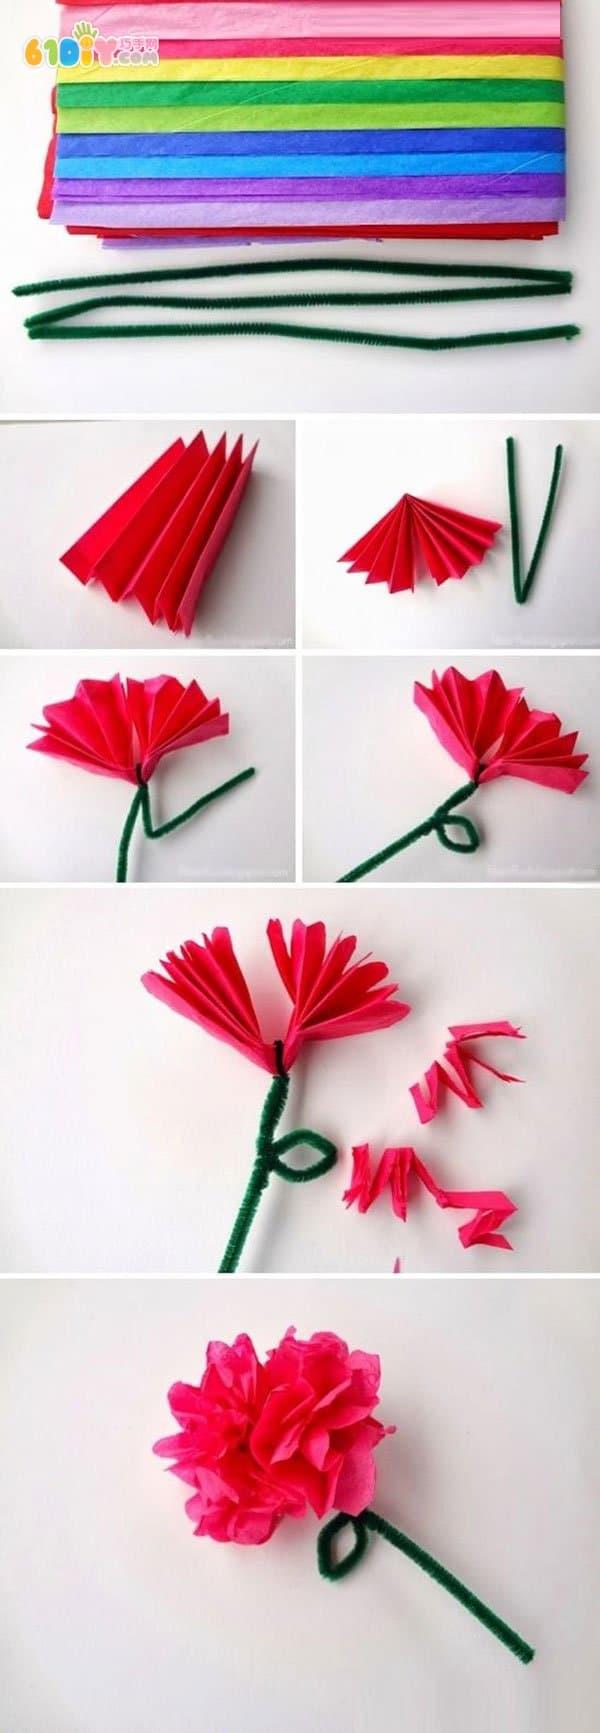 Women's Day handmade paper flower practice